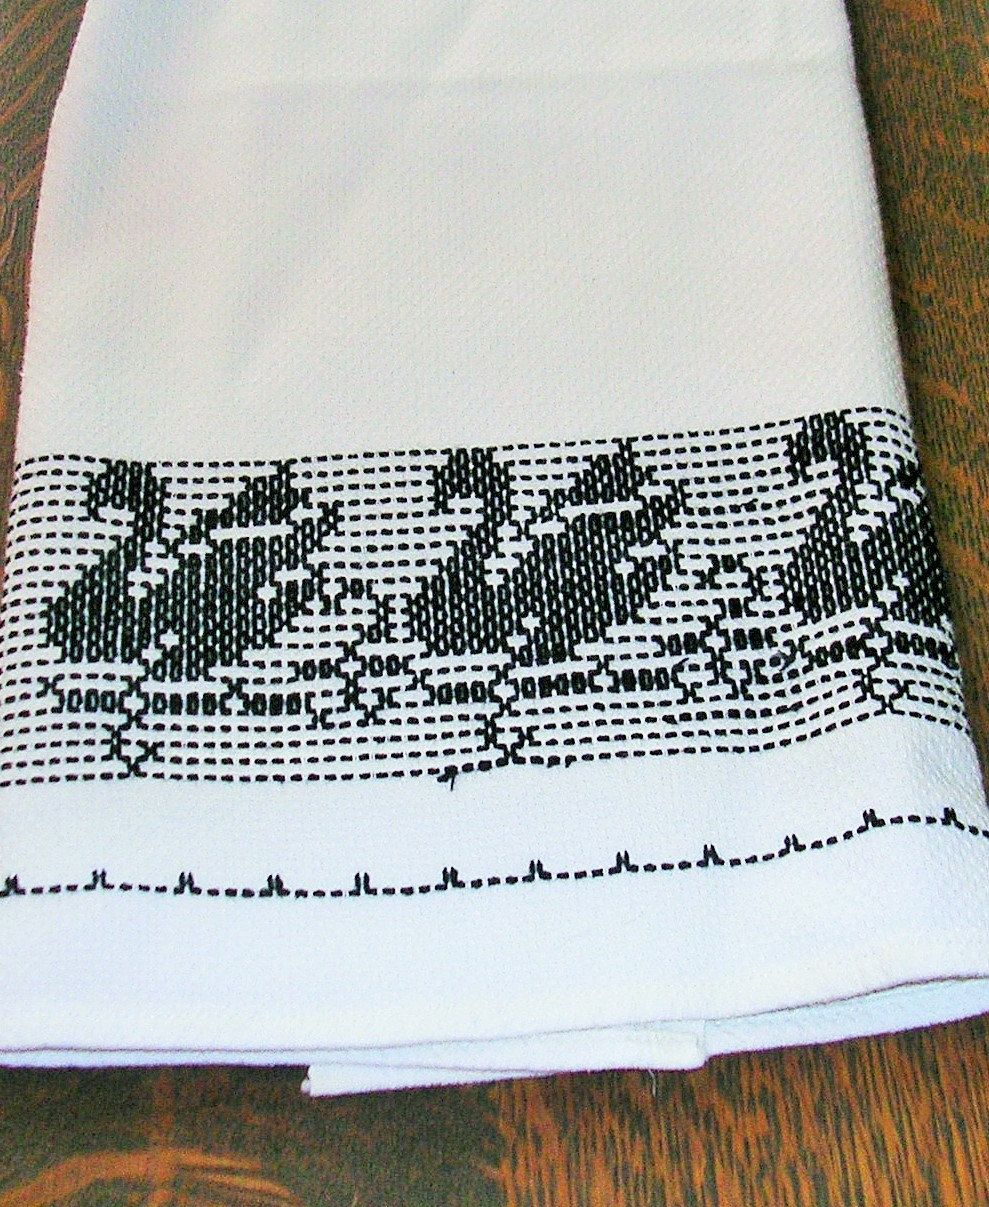 https://www.etsy.com/listing/227154877/vintage-huck-towel-with-black ...